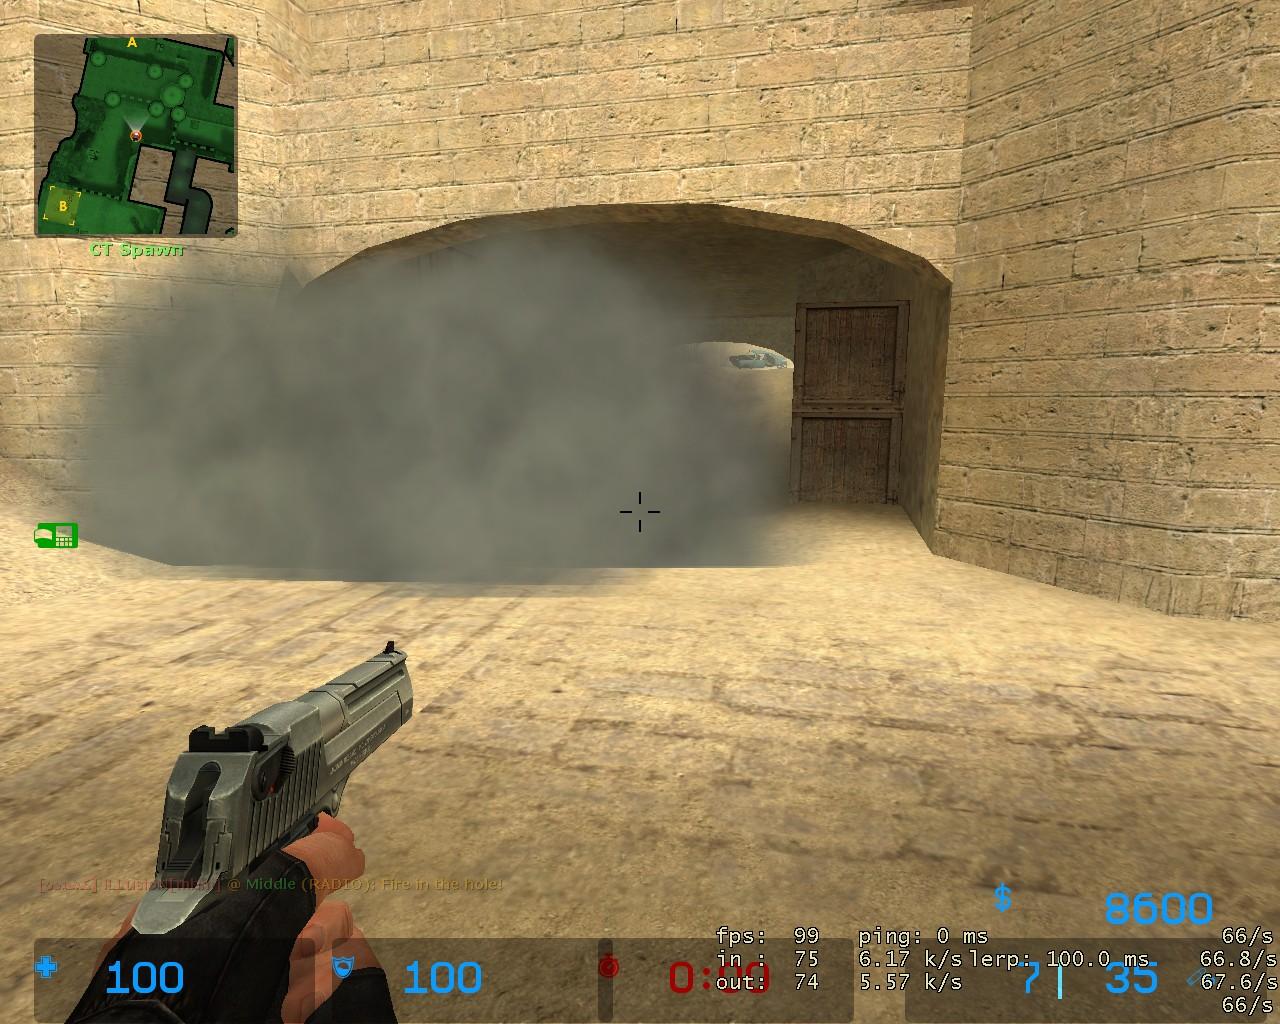 New BF2-de_dust2-ct-spawn-mid-effect-jpg